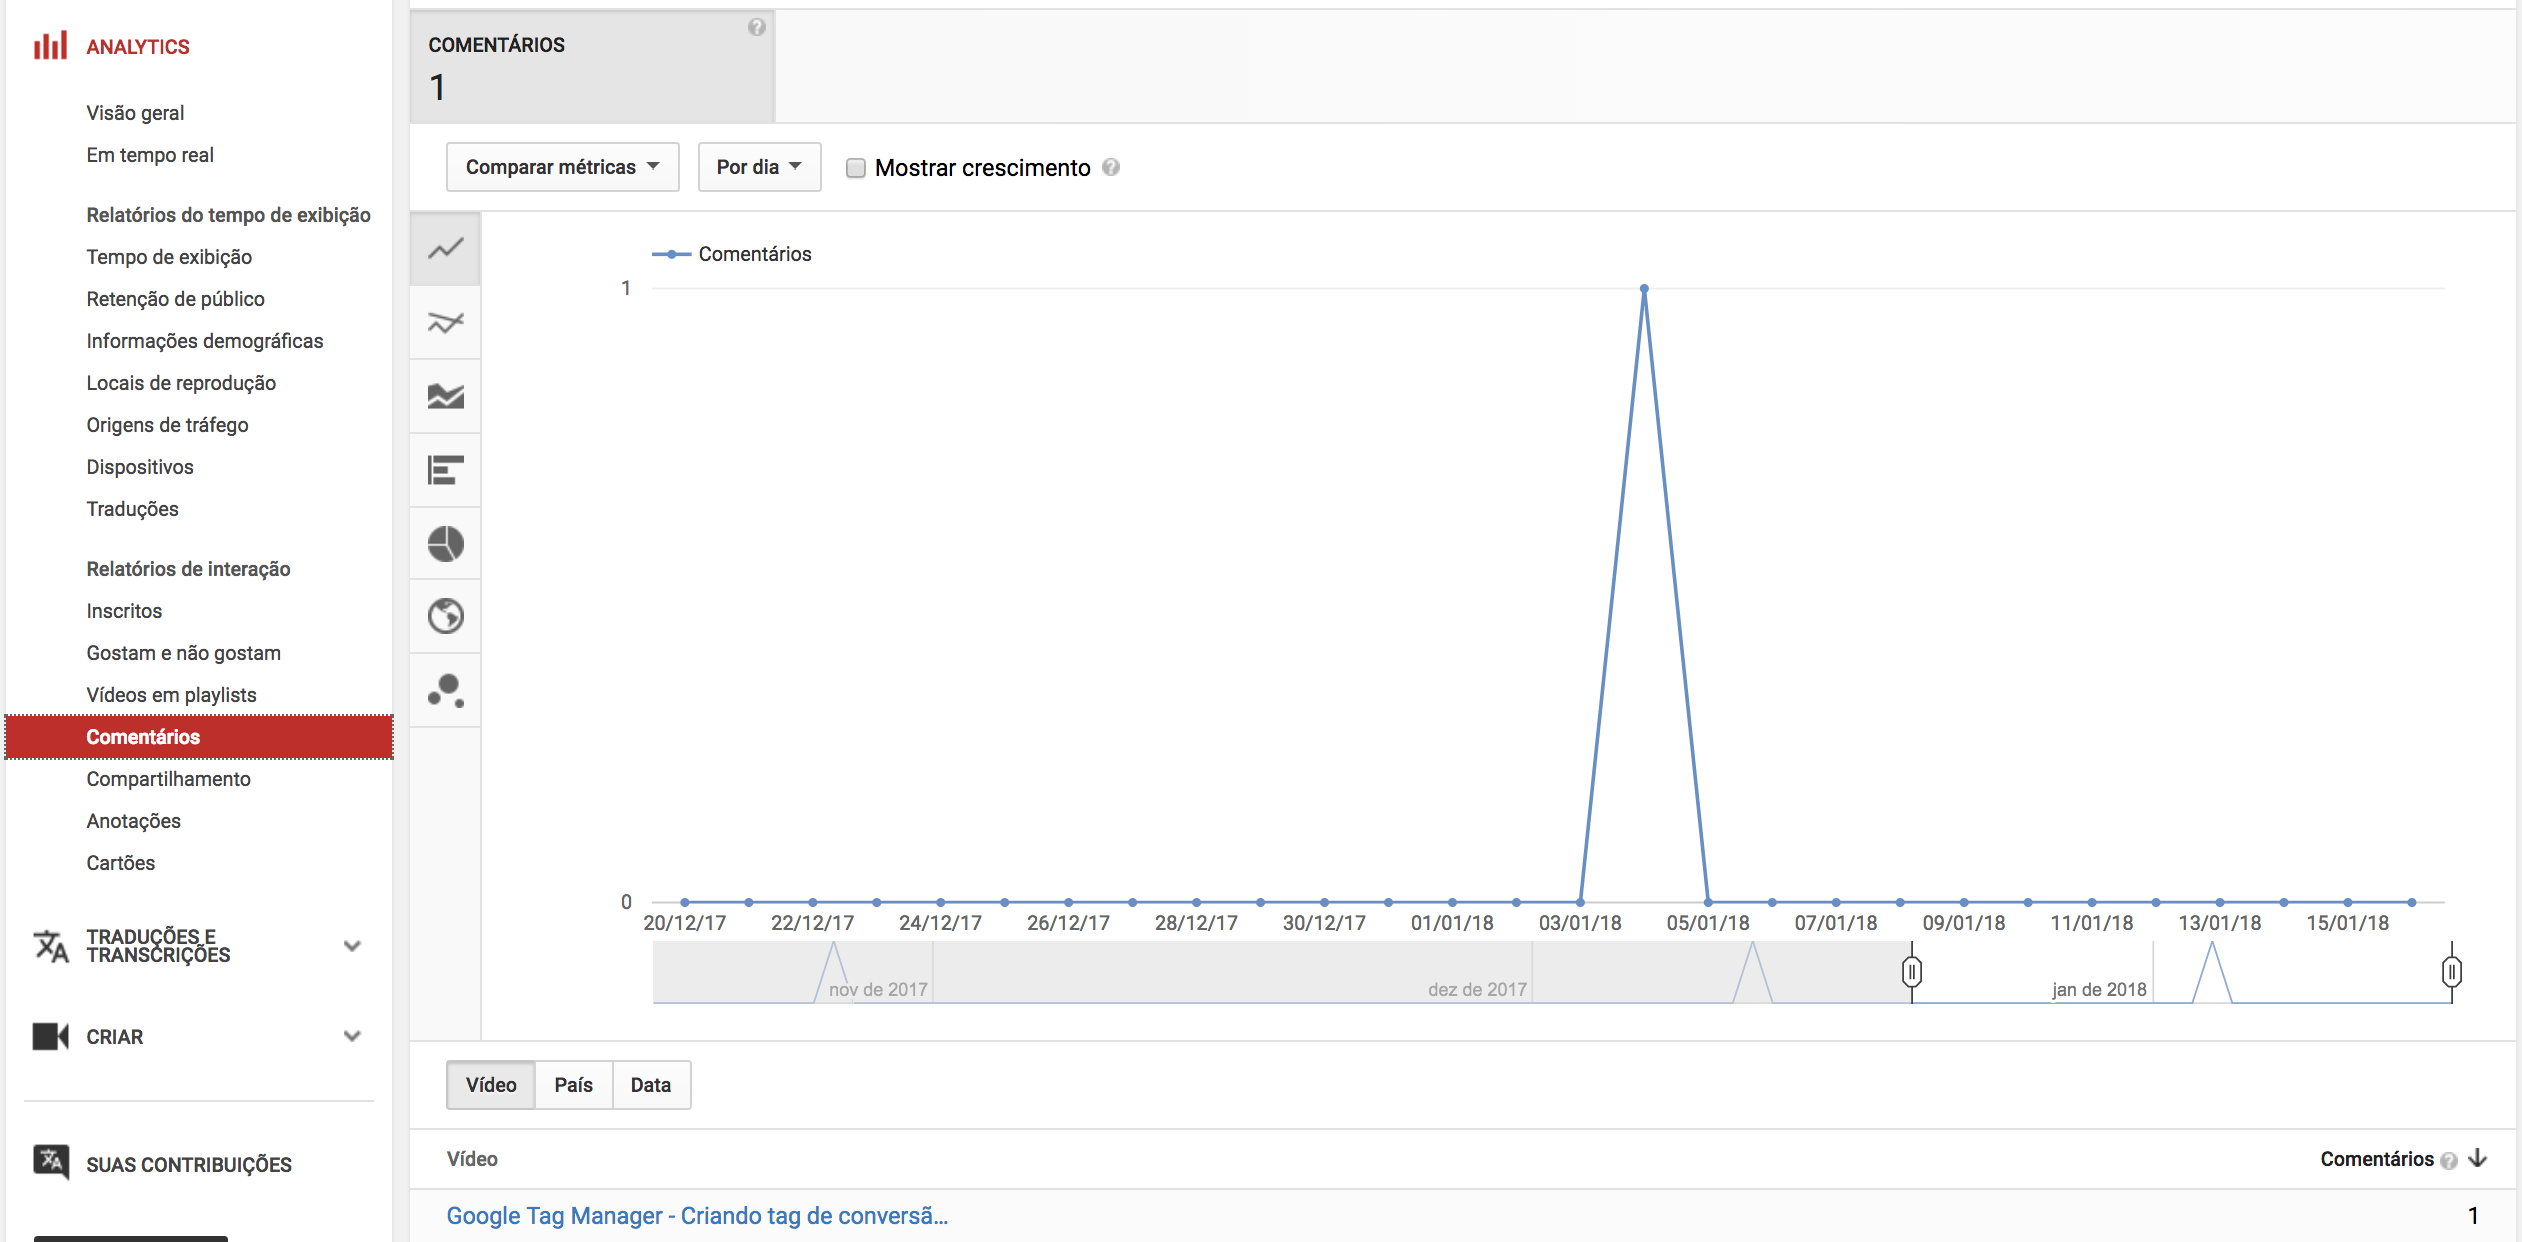 Comentários-YouTube-Analytics.png